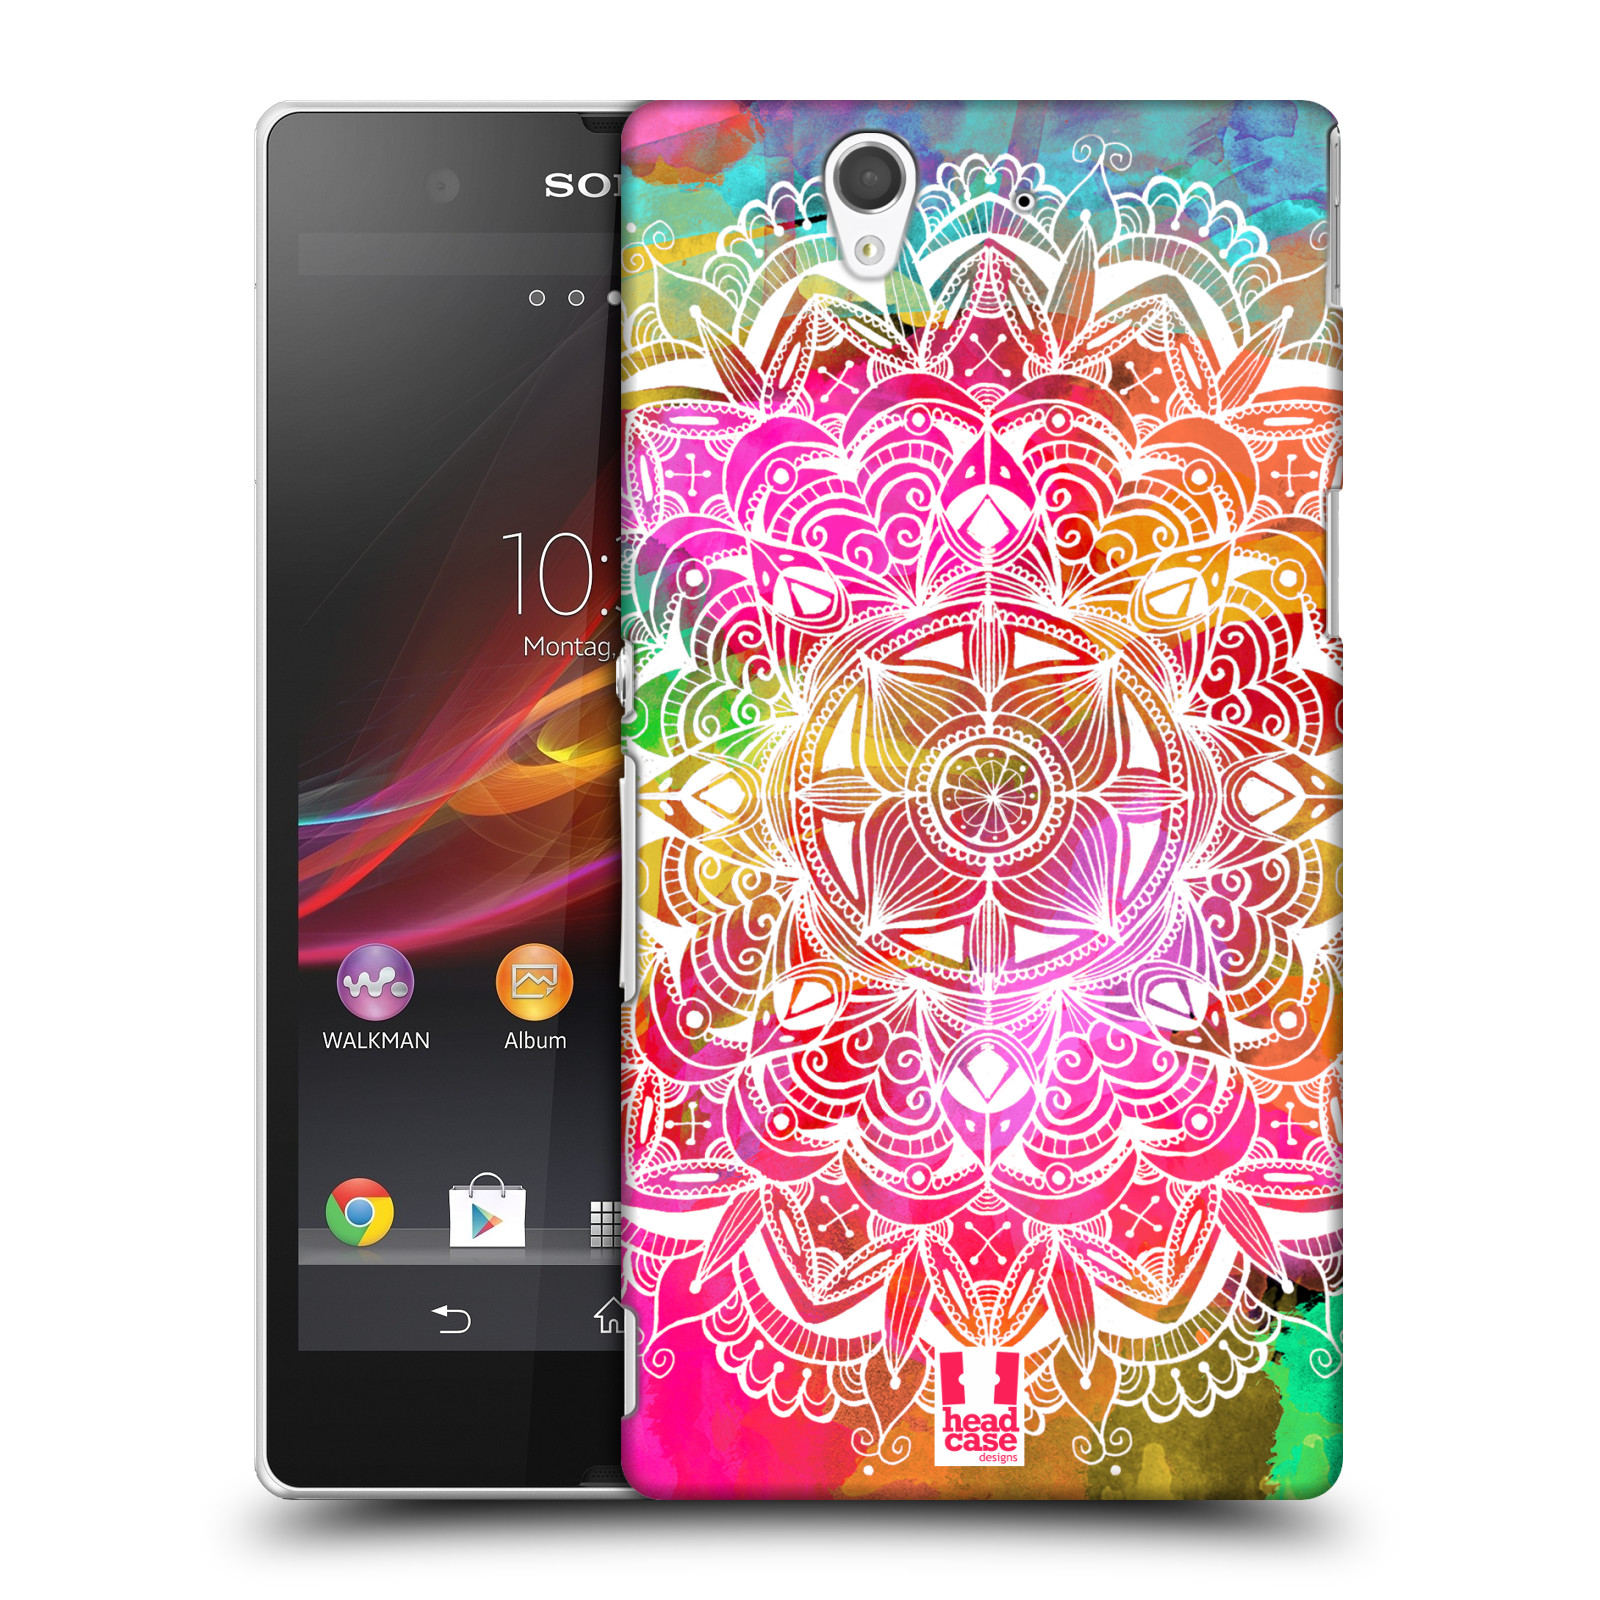 Plastové pouzdro na mobil Sony Xperia Z C6603 HEAD CASE Mandala Doodle Watercolour (Kryt či obal na mobilní telefon Sony Xperia Z)